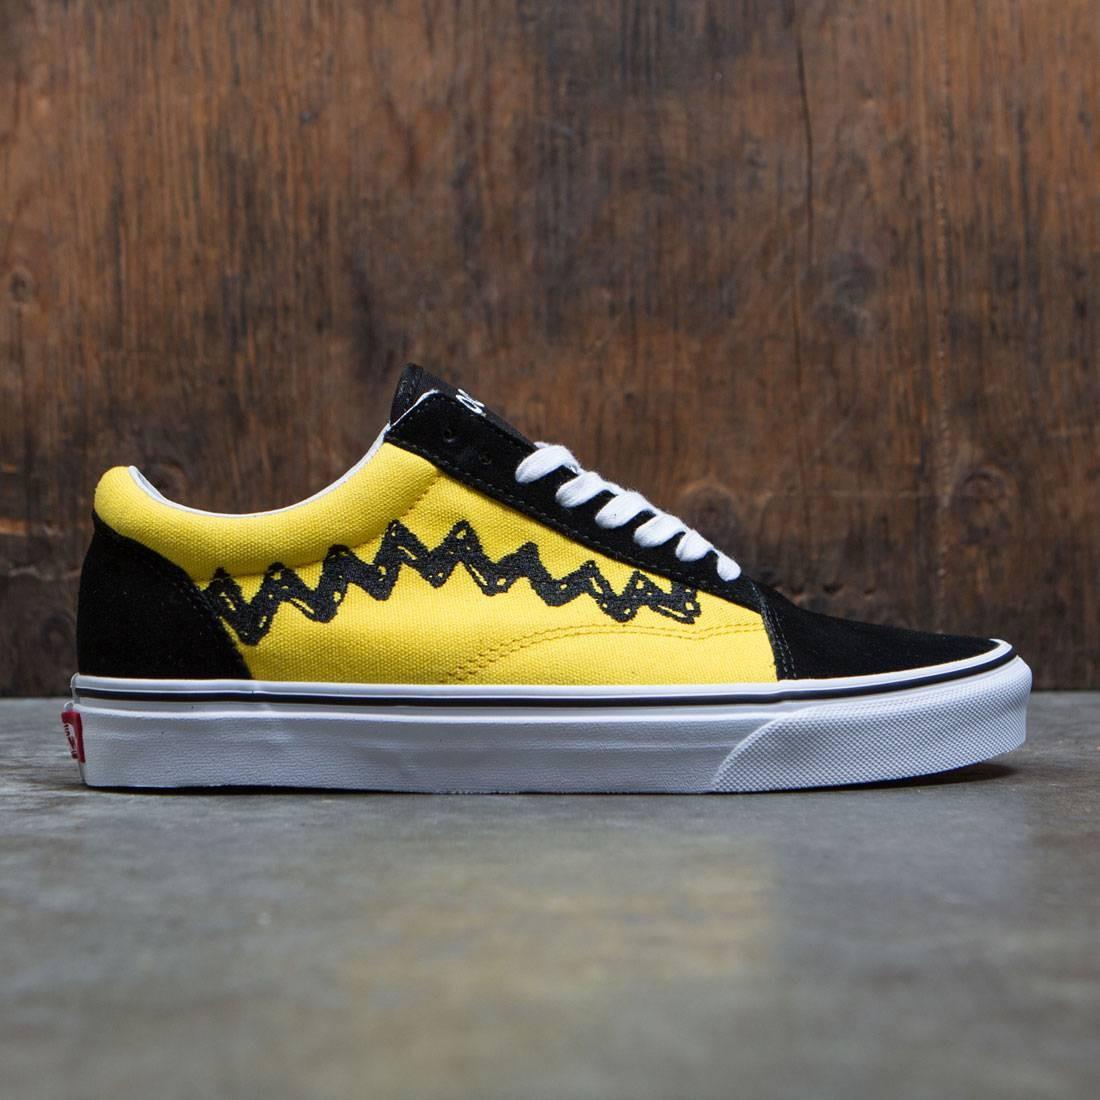 vans old skool x peanuts yellow